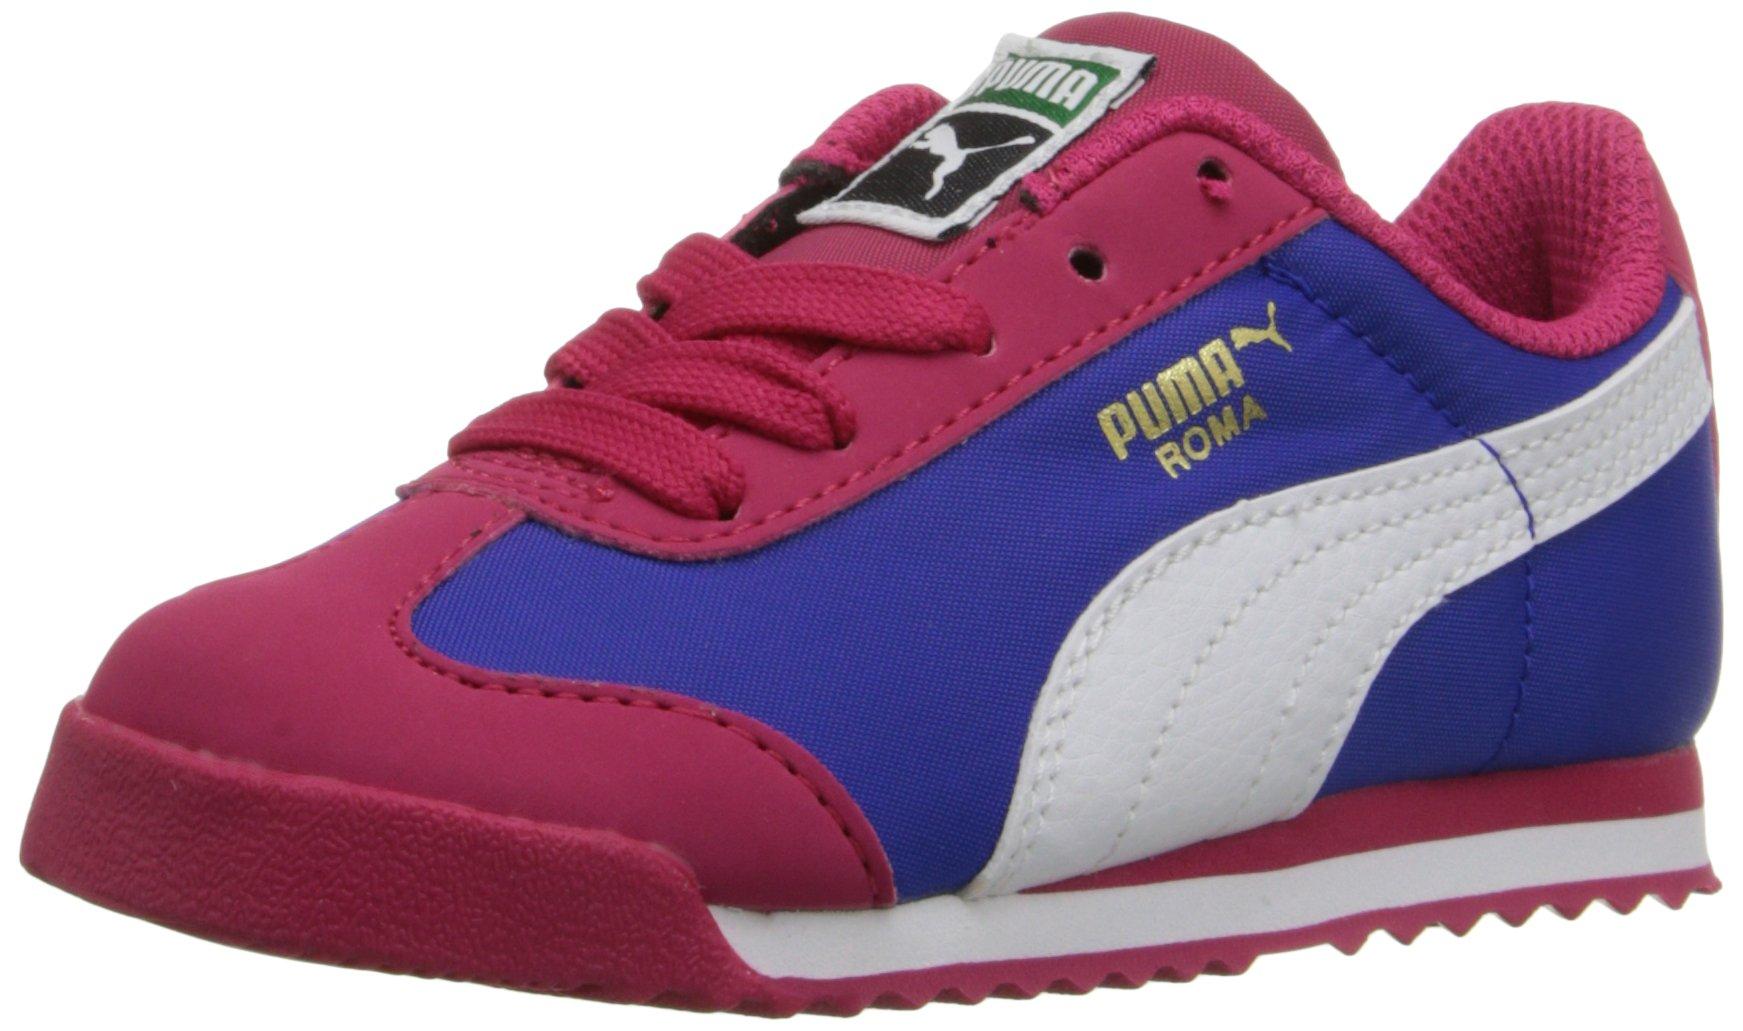 PUMA Roma Basic Summer Kids Classic Style Sneaker (Toddler/Little Kid) , Rose Red/White, 9 M US Toddler